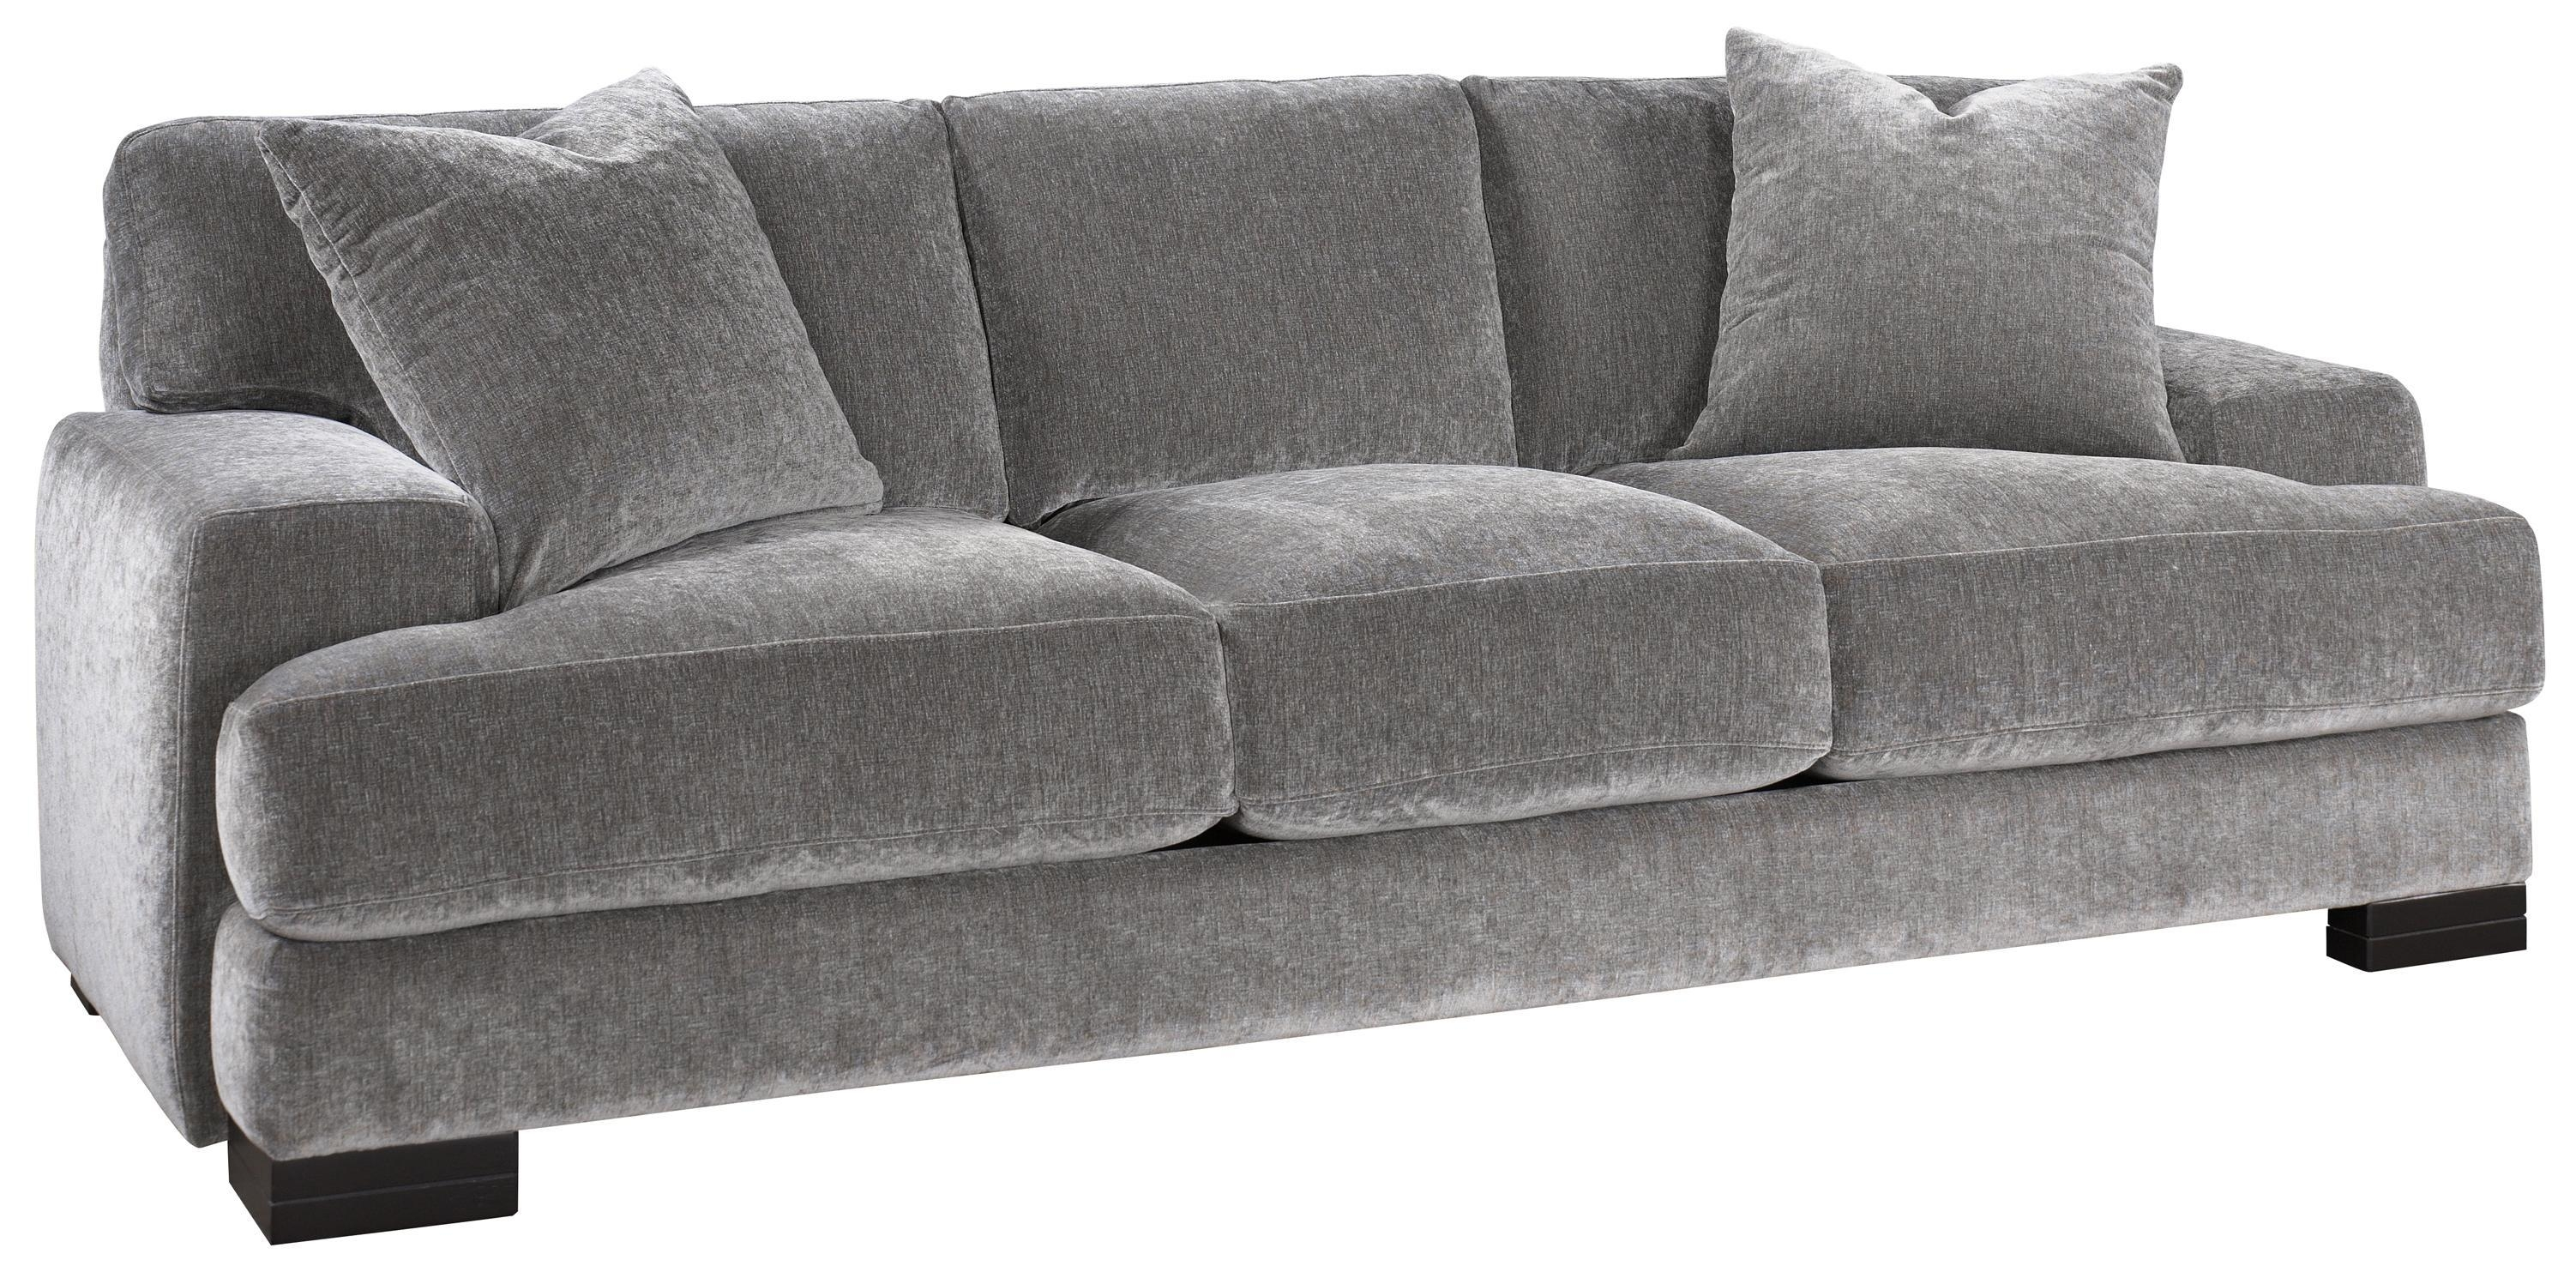 Jonathan Louis Burton Modern Sofa With Low Track Arms And Exposed Inside Jonathan Sofa (Image 9 of 20)